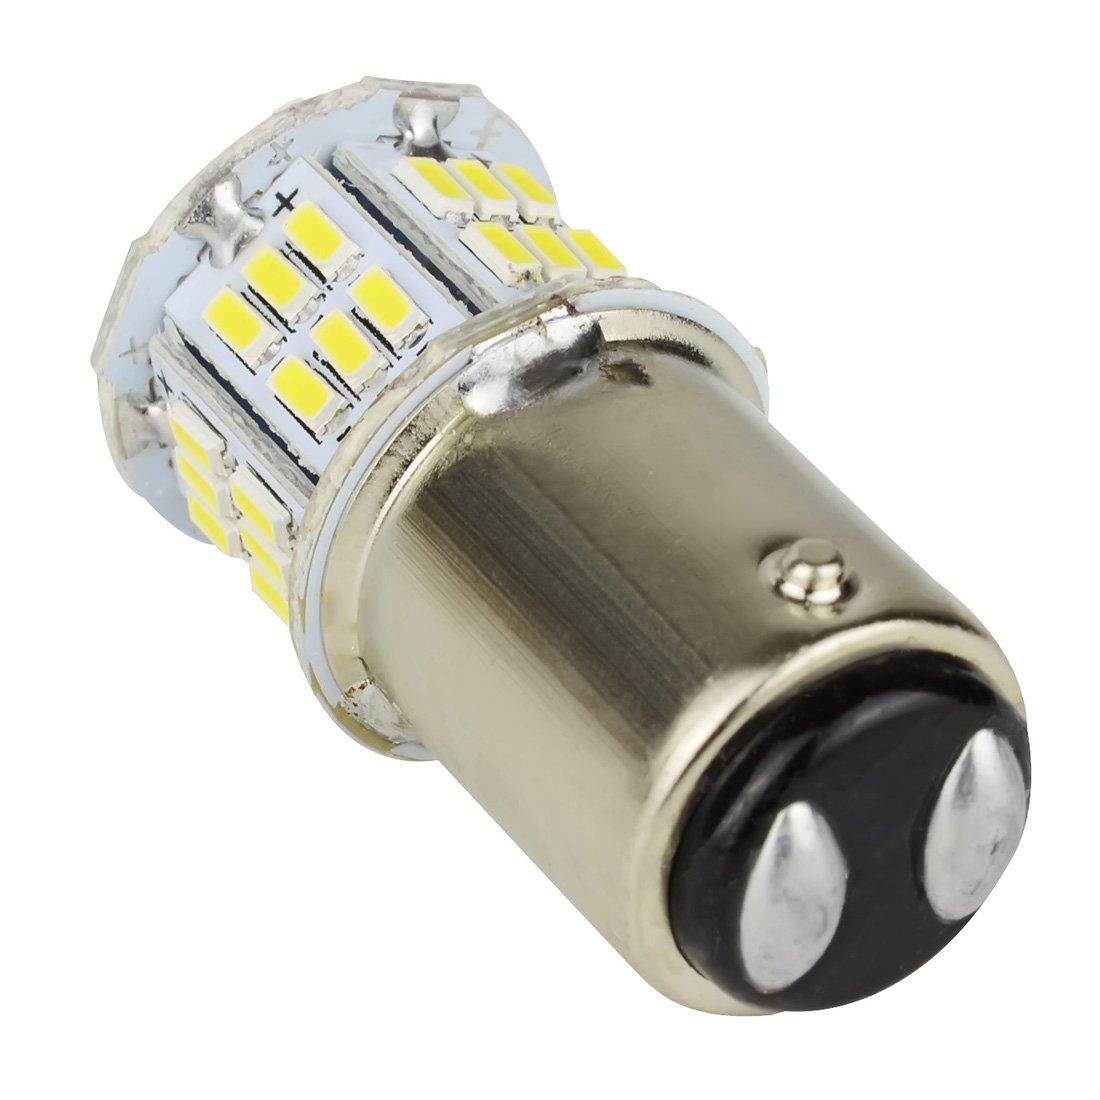 Safego w5w 194 501 2825 LED 30-3014SMD Wedge For Car Interior Side Marker Dome Reading Lights White 6000K Pack of 2 T10 168 Led Car Bulb